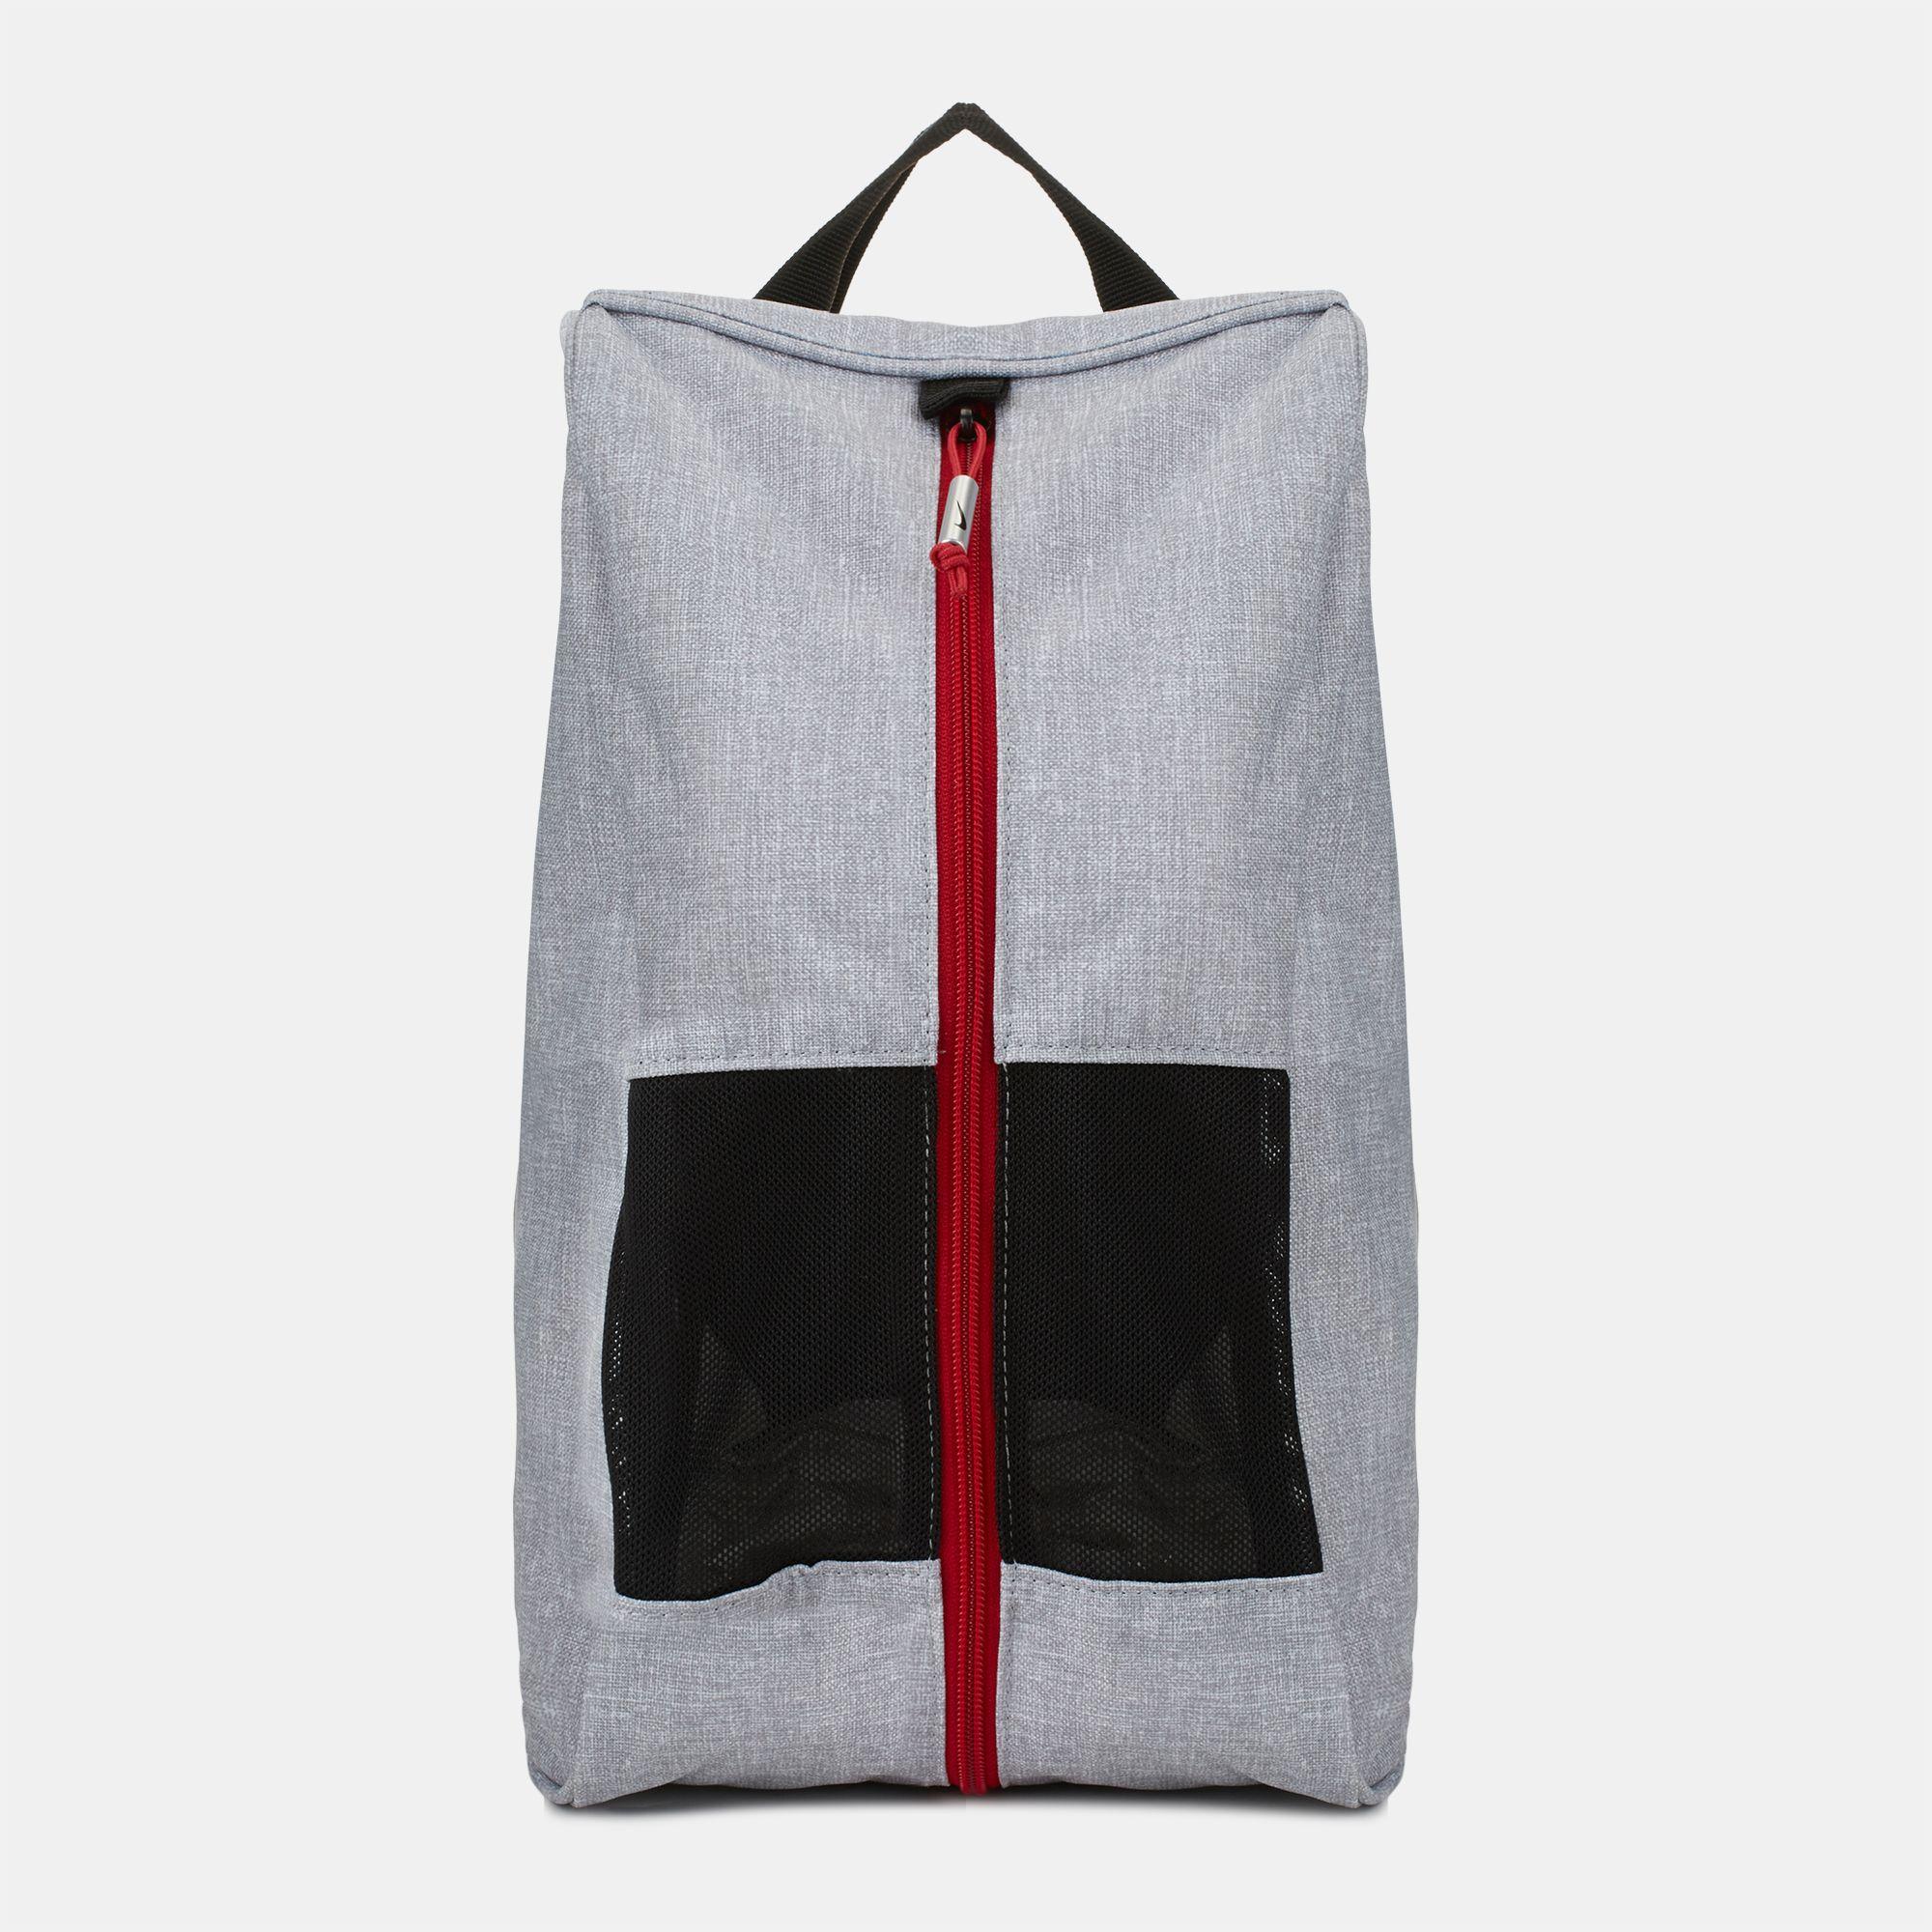 Shop Multi Nike Golf Sport III Shoe Tote Bag for Unisex by Nike Golf ... 2220094067ed7